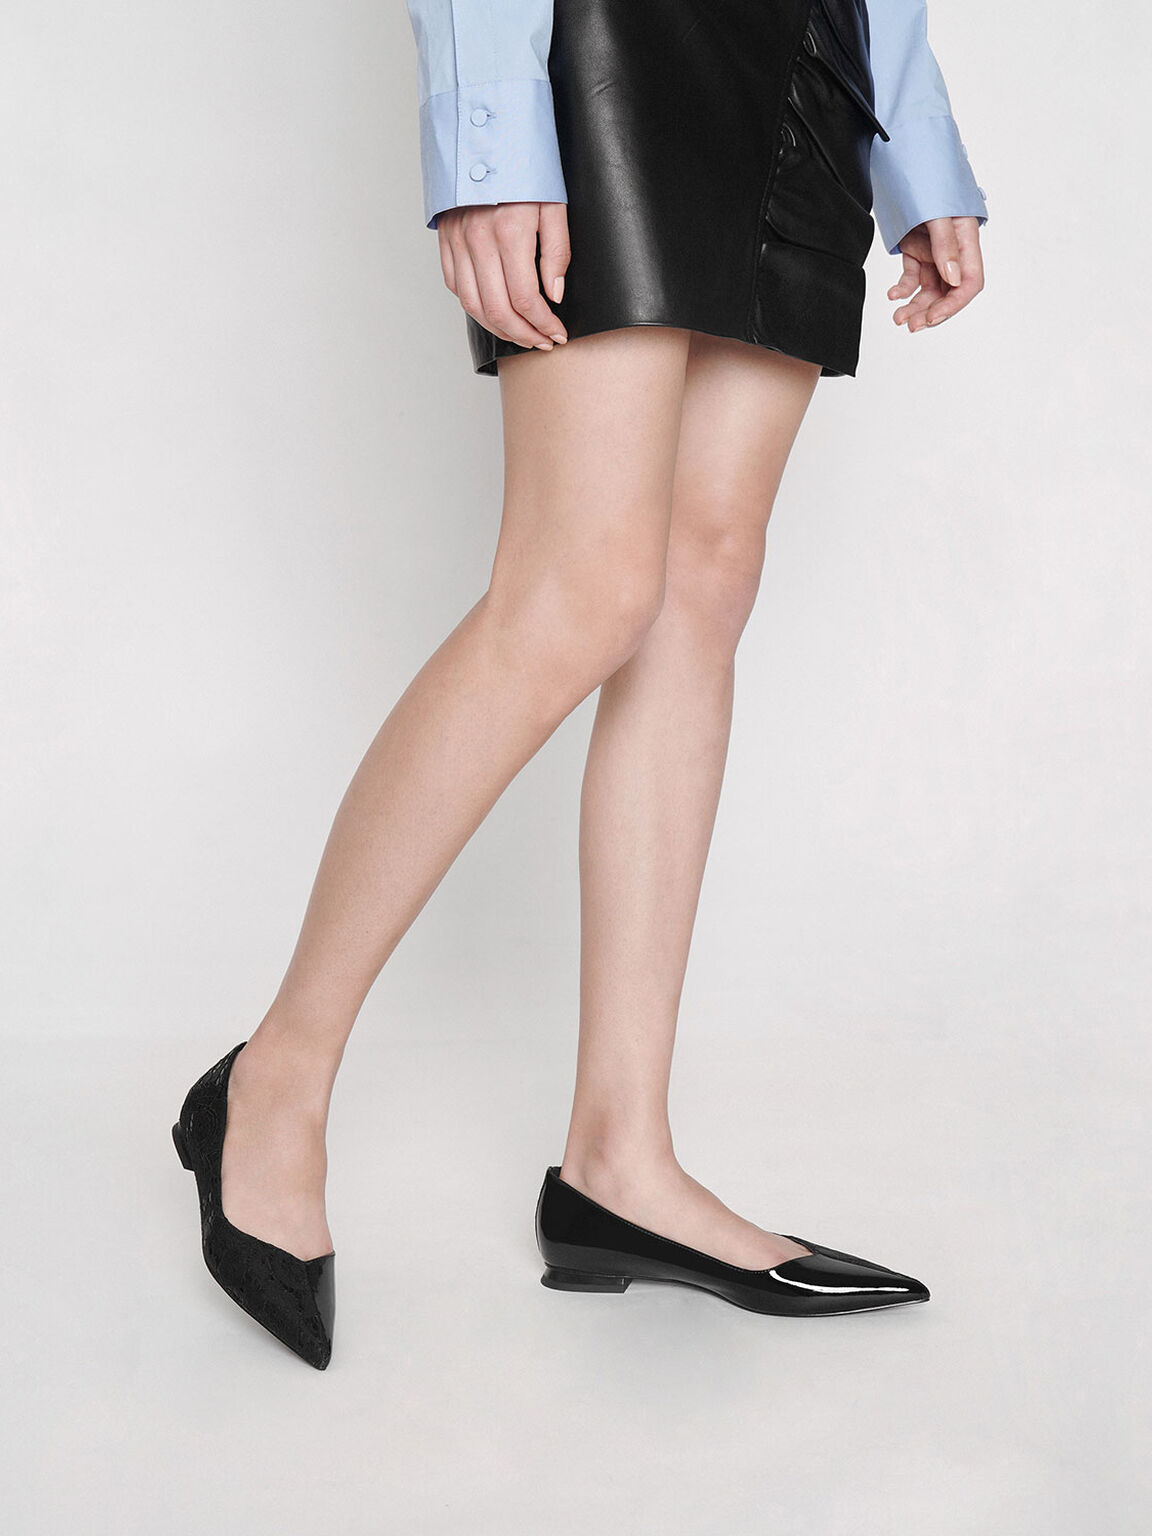 Patent Leather Lace Ballerina Flats, Black, hi-res